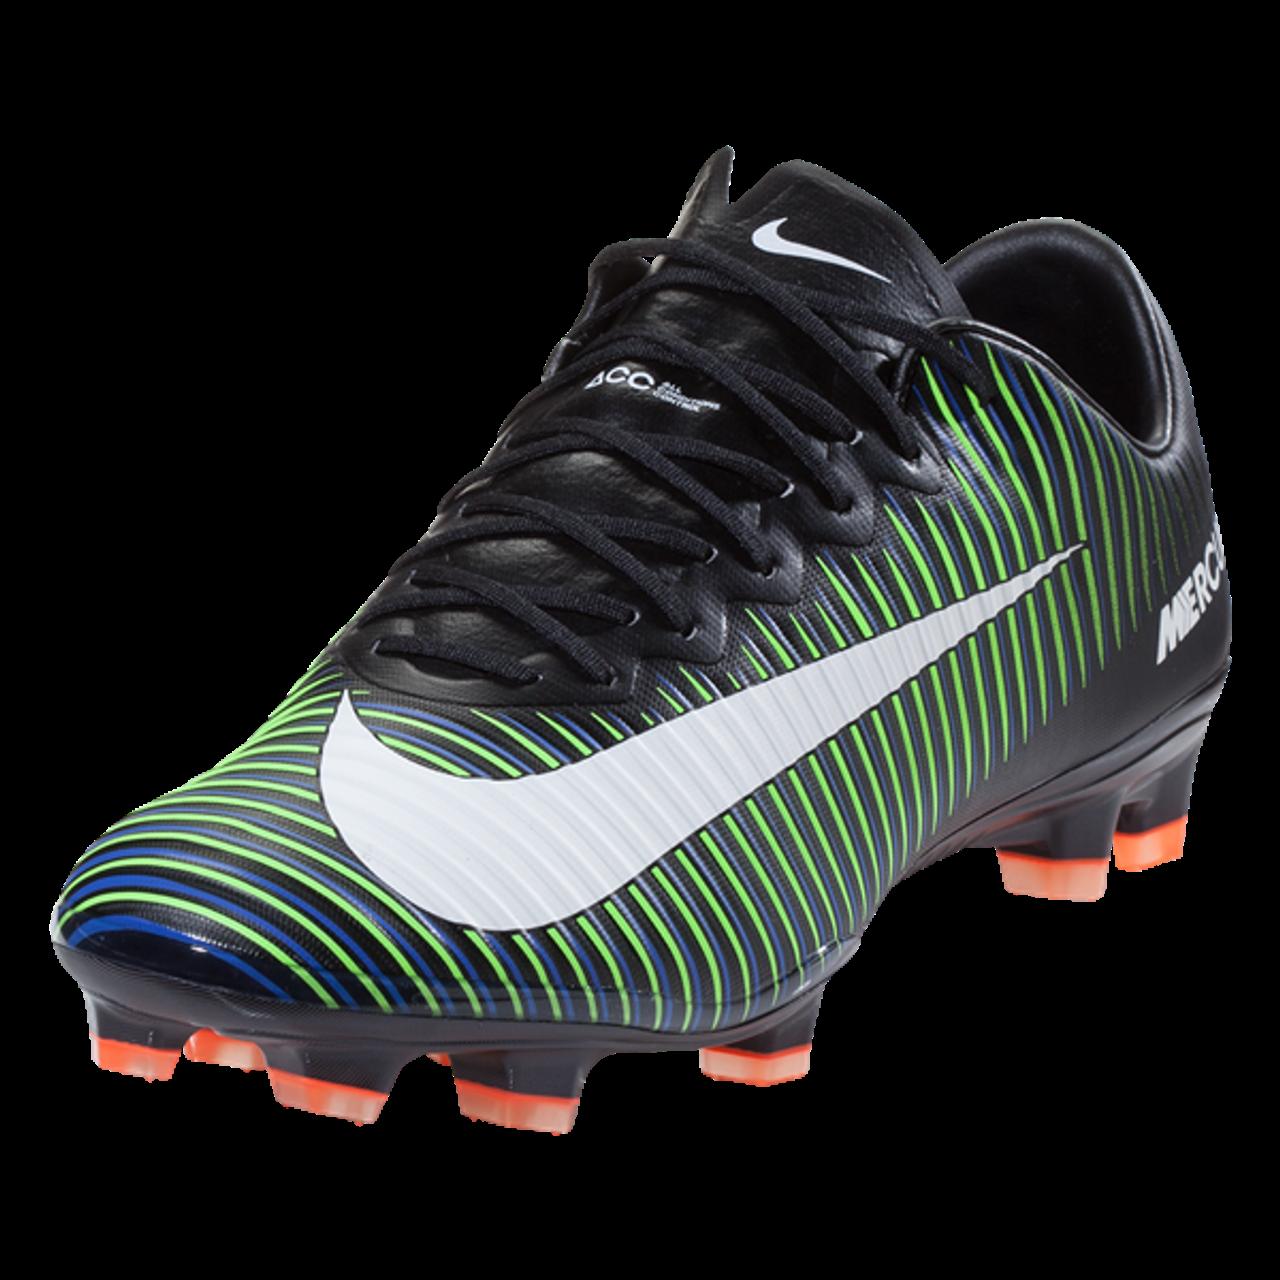 Nike Mercurial Vapor XI FG - Blk/Green